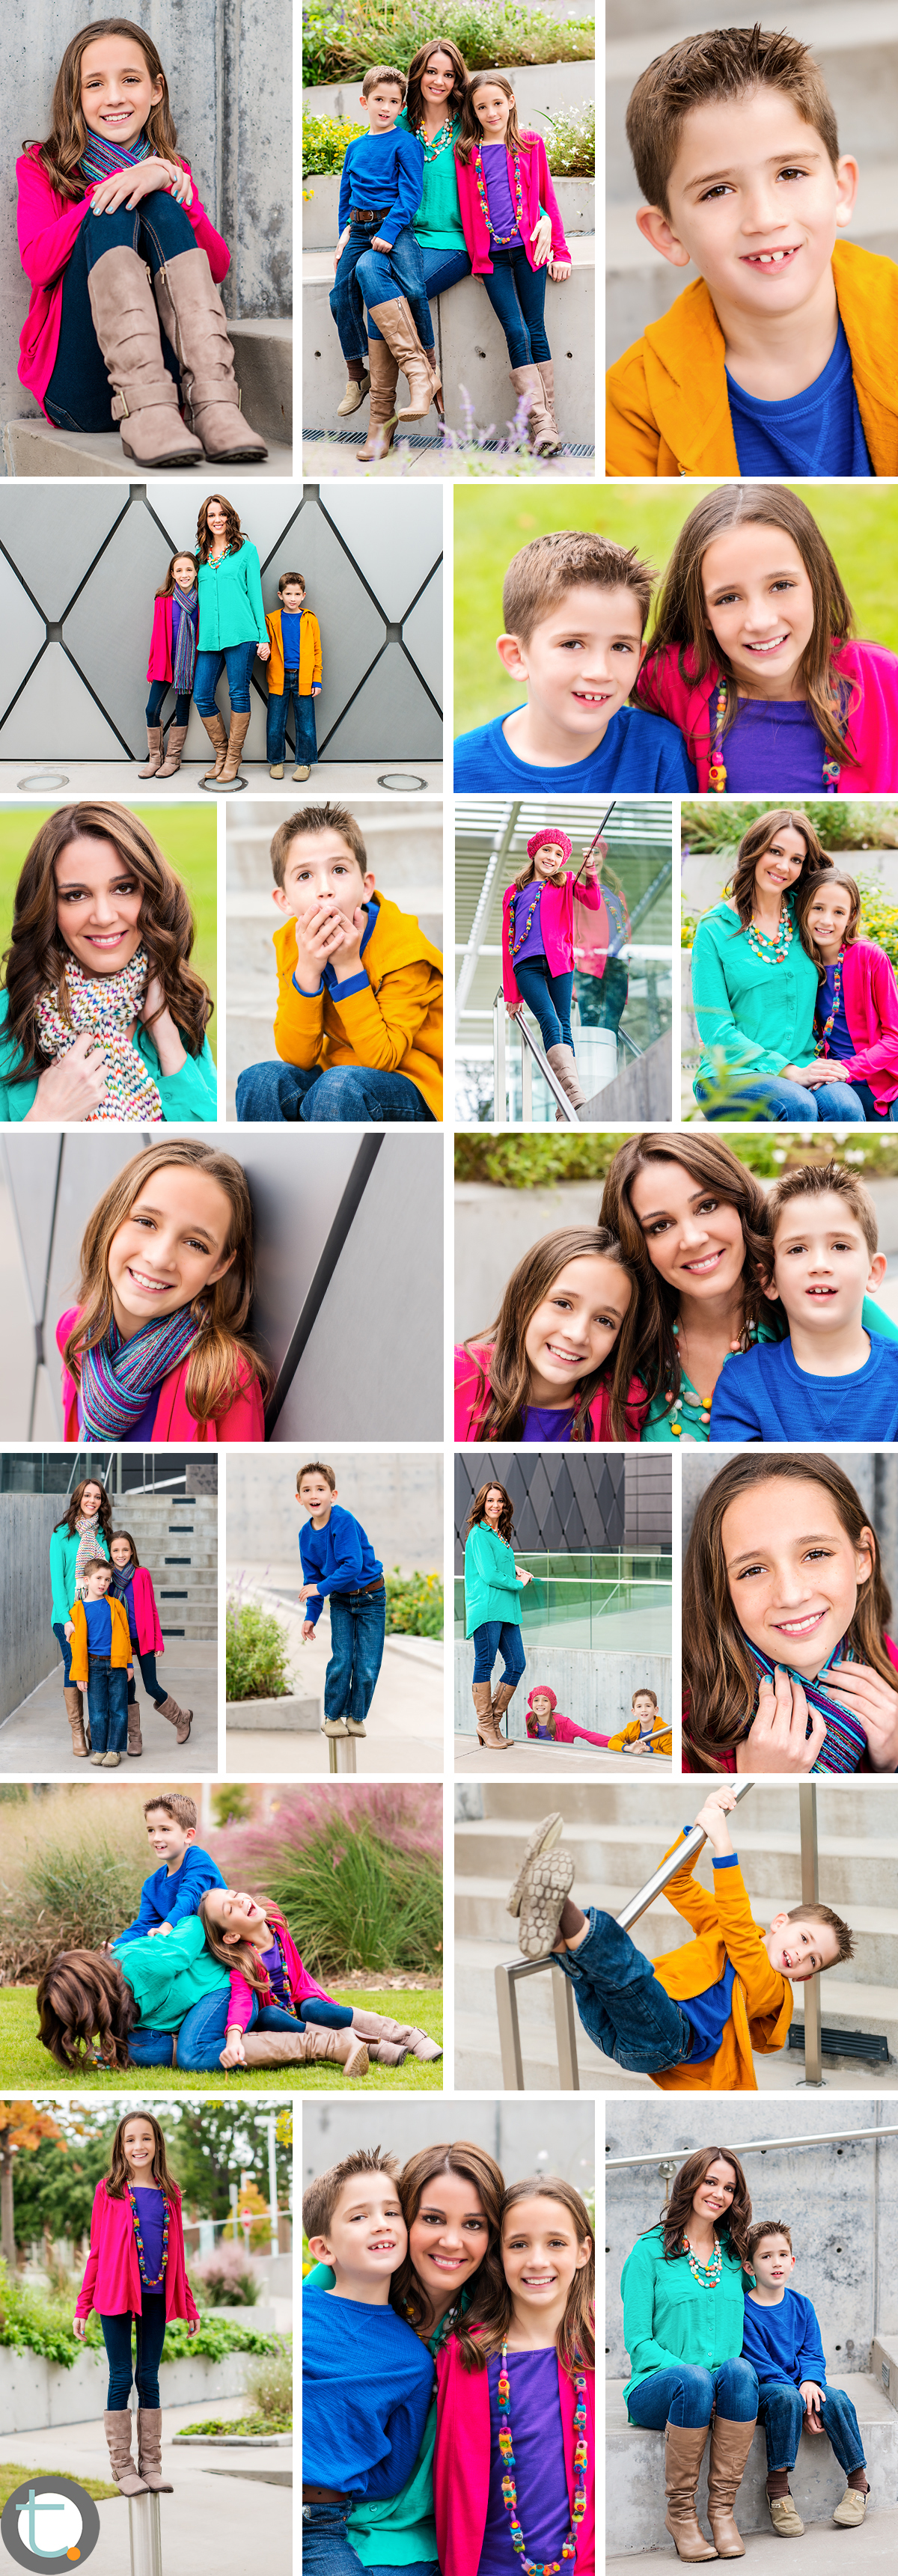 audra_kids_family_arts_district_dallas_color.jpg